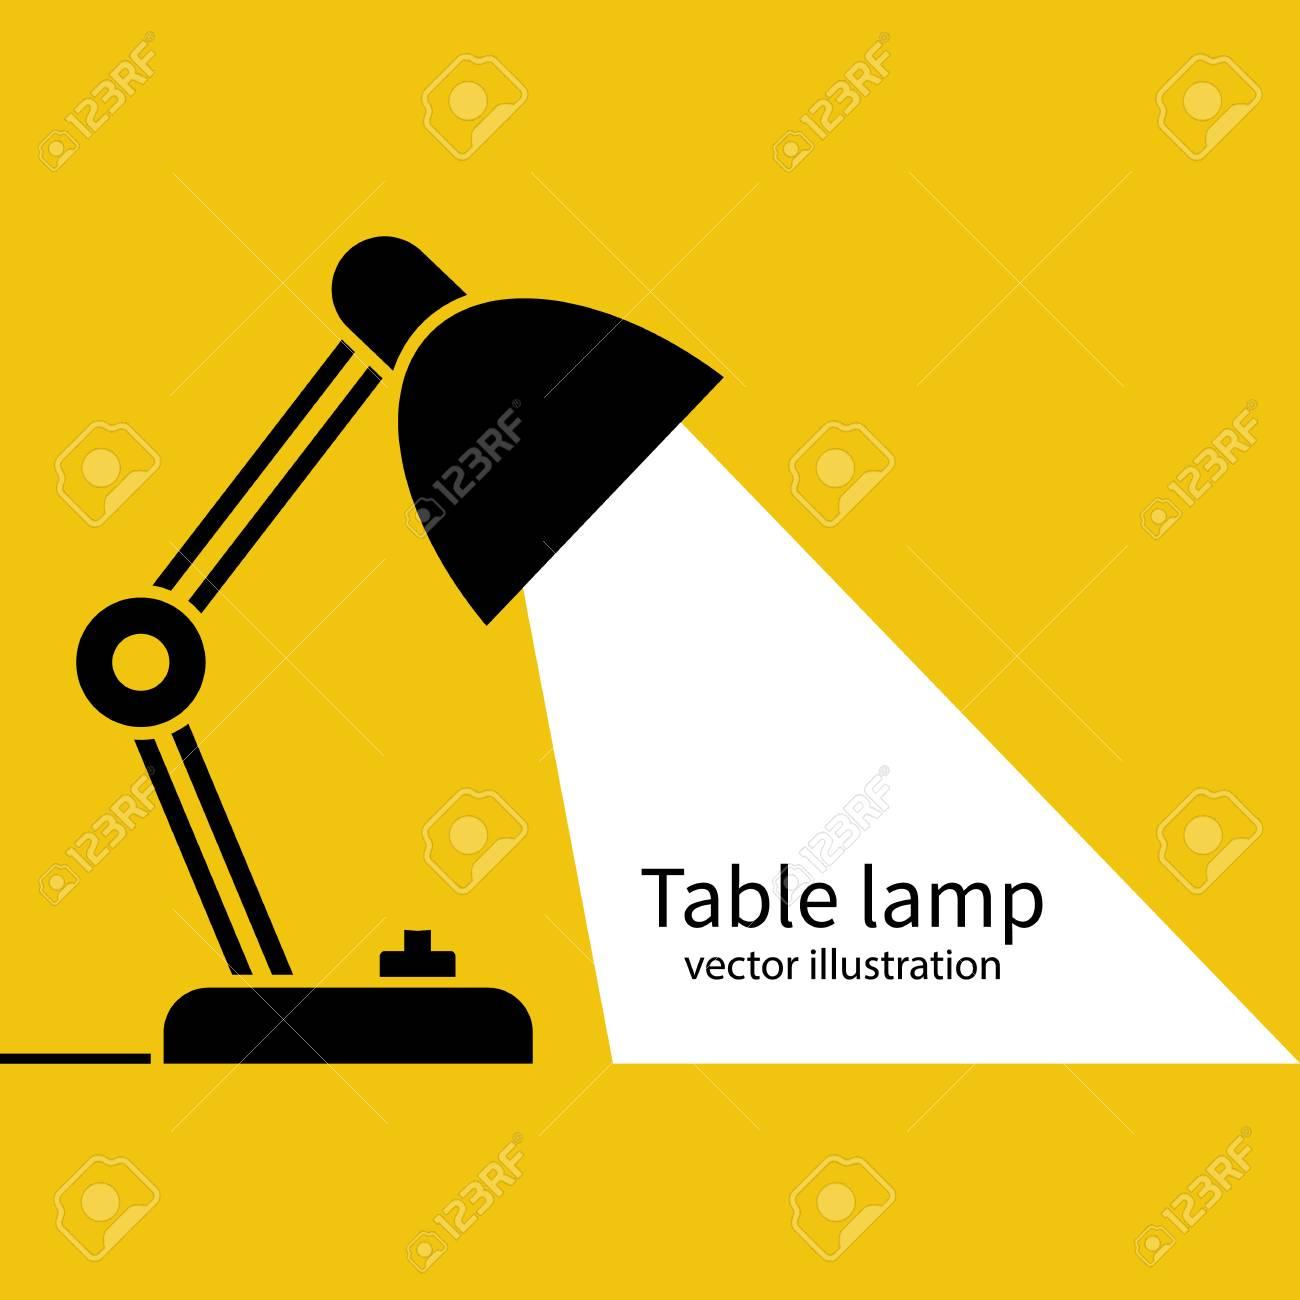 Table office lamp Desktop electric Vector illustration flat design. - 95070935